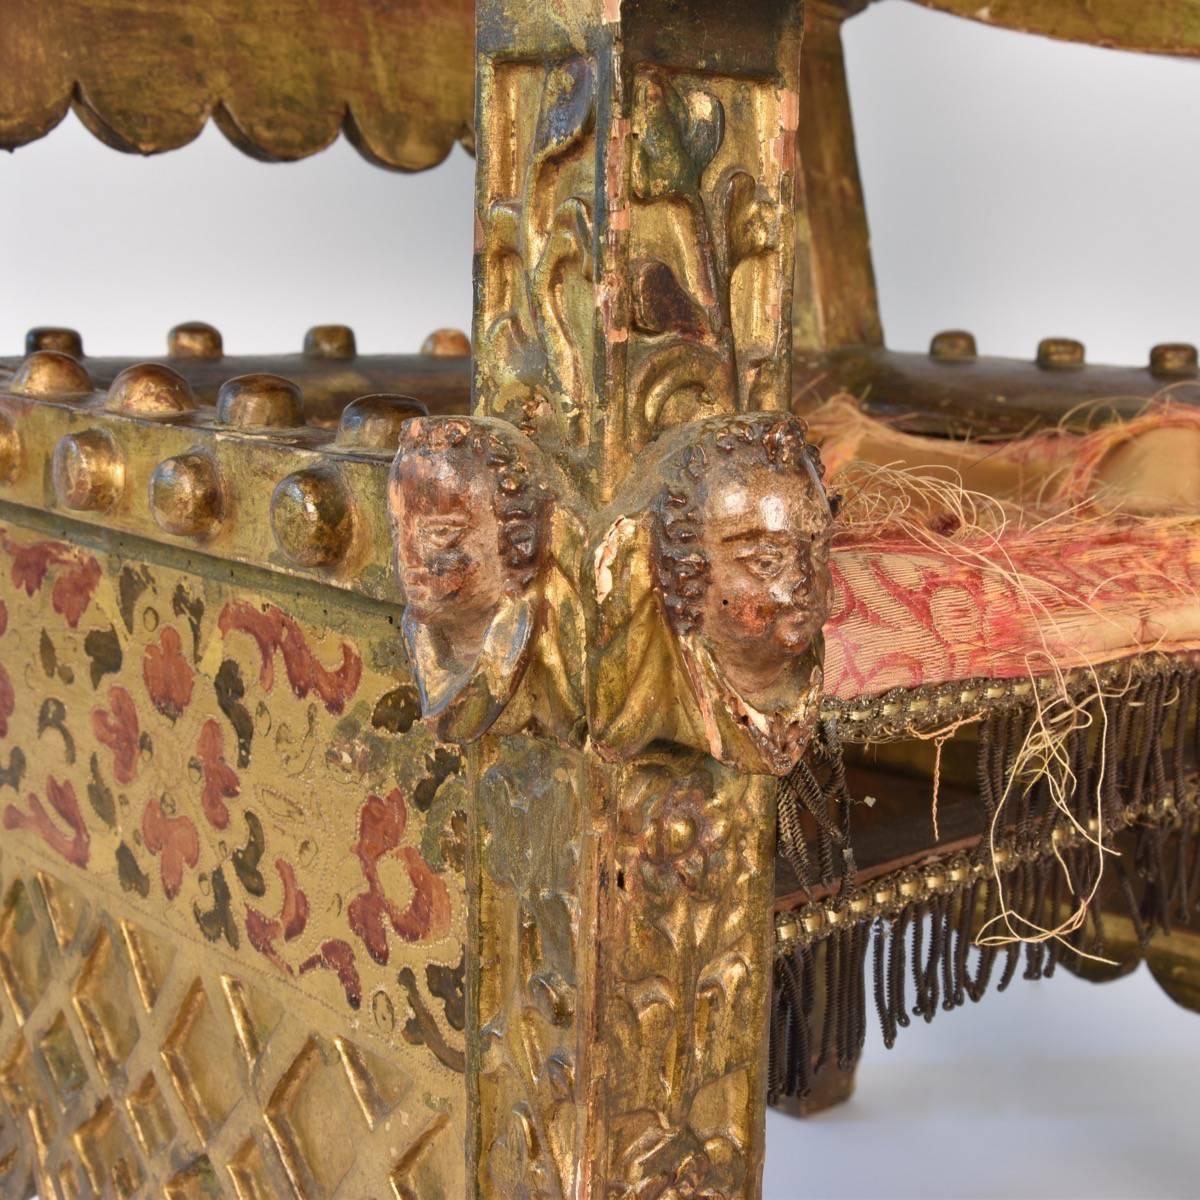 16th century Mexican chair